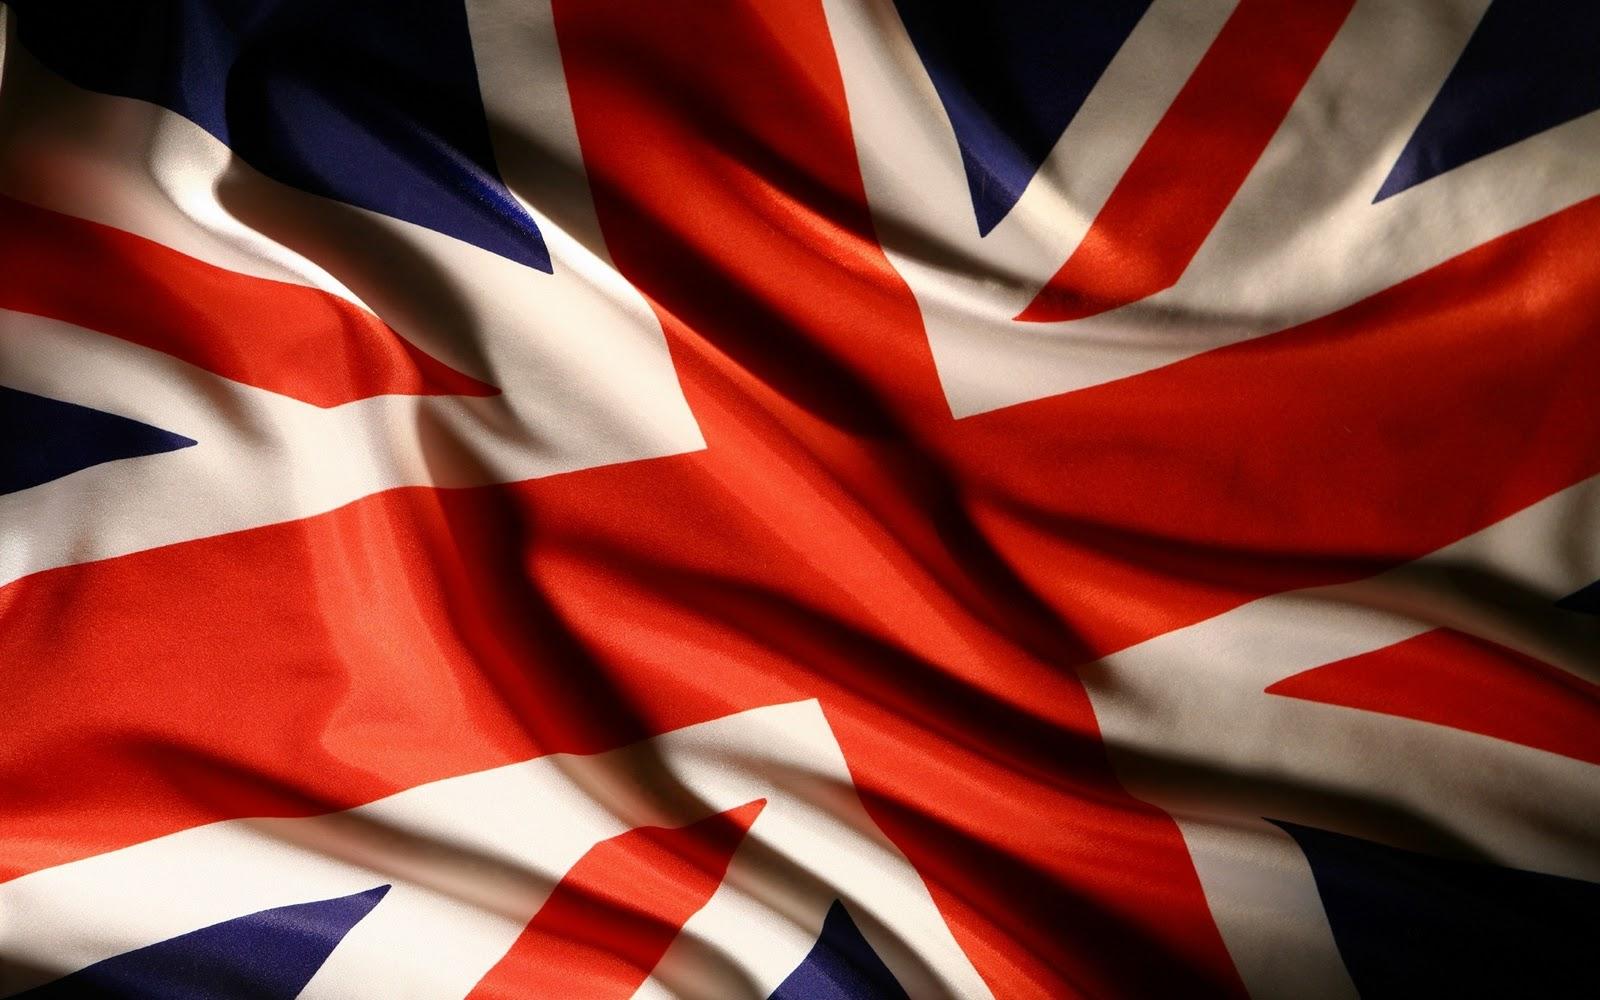 http://2.bp.blogspot.com/-hee_r5XagUQ/Tv89QCXvZTI/AAAAAAAAAcU/BvmQTFjTARo/s1600/british-flag-wallpapers_23668_1920x1200.jpg